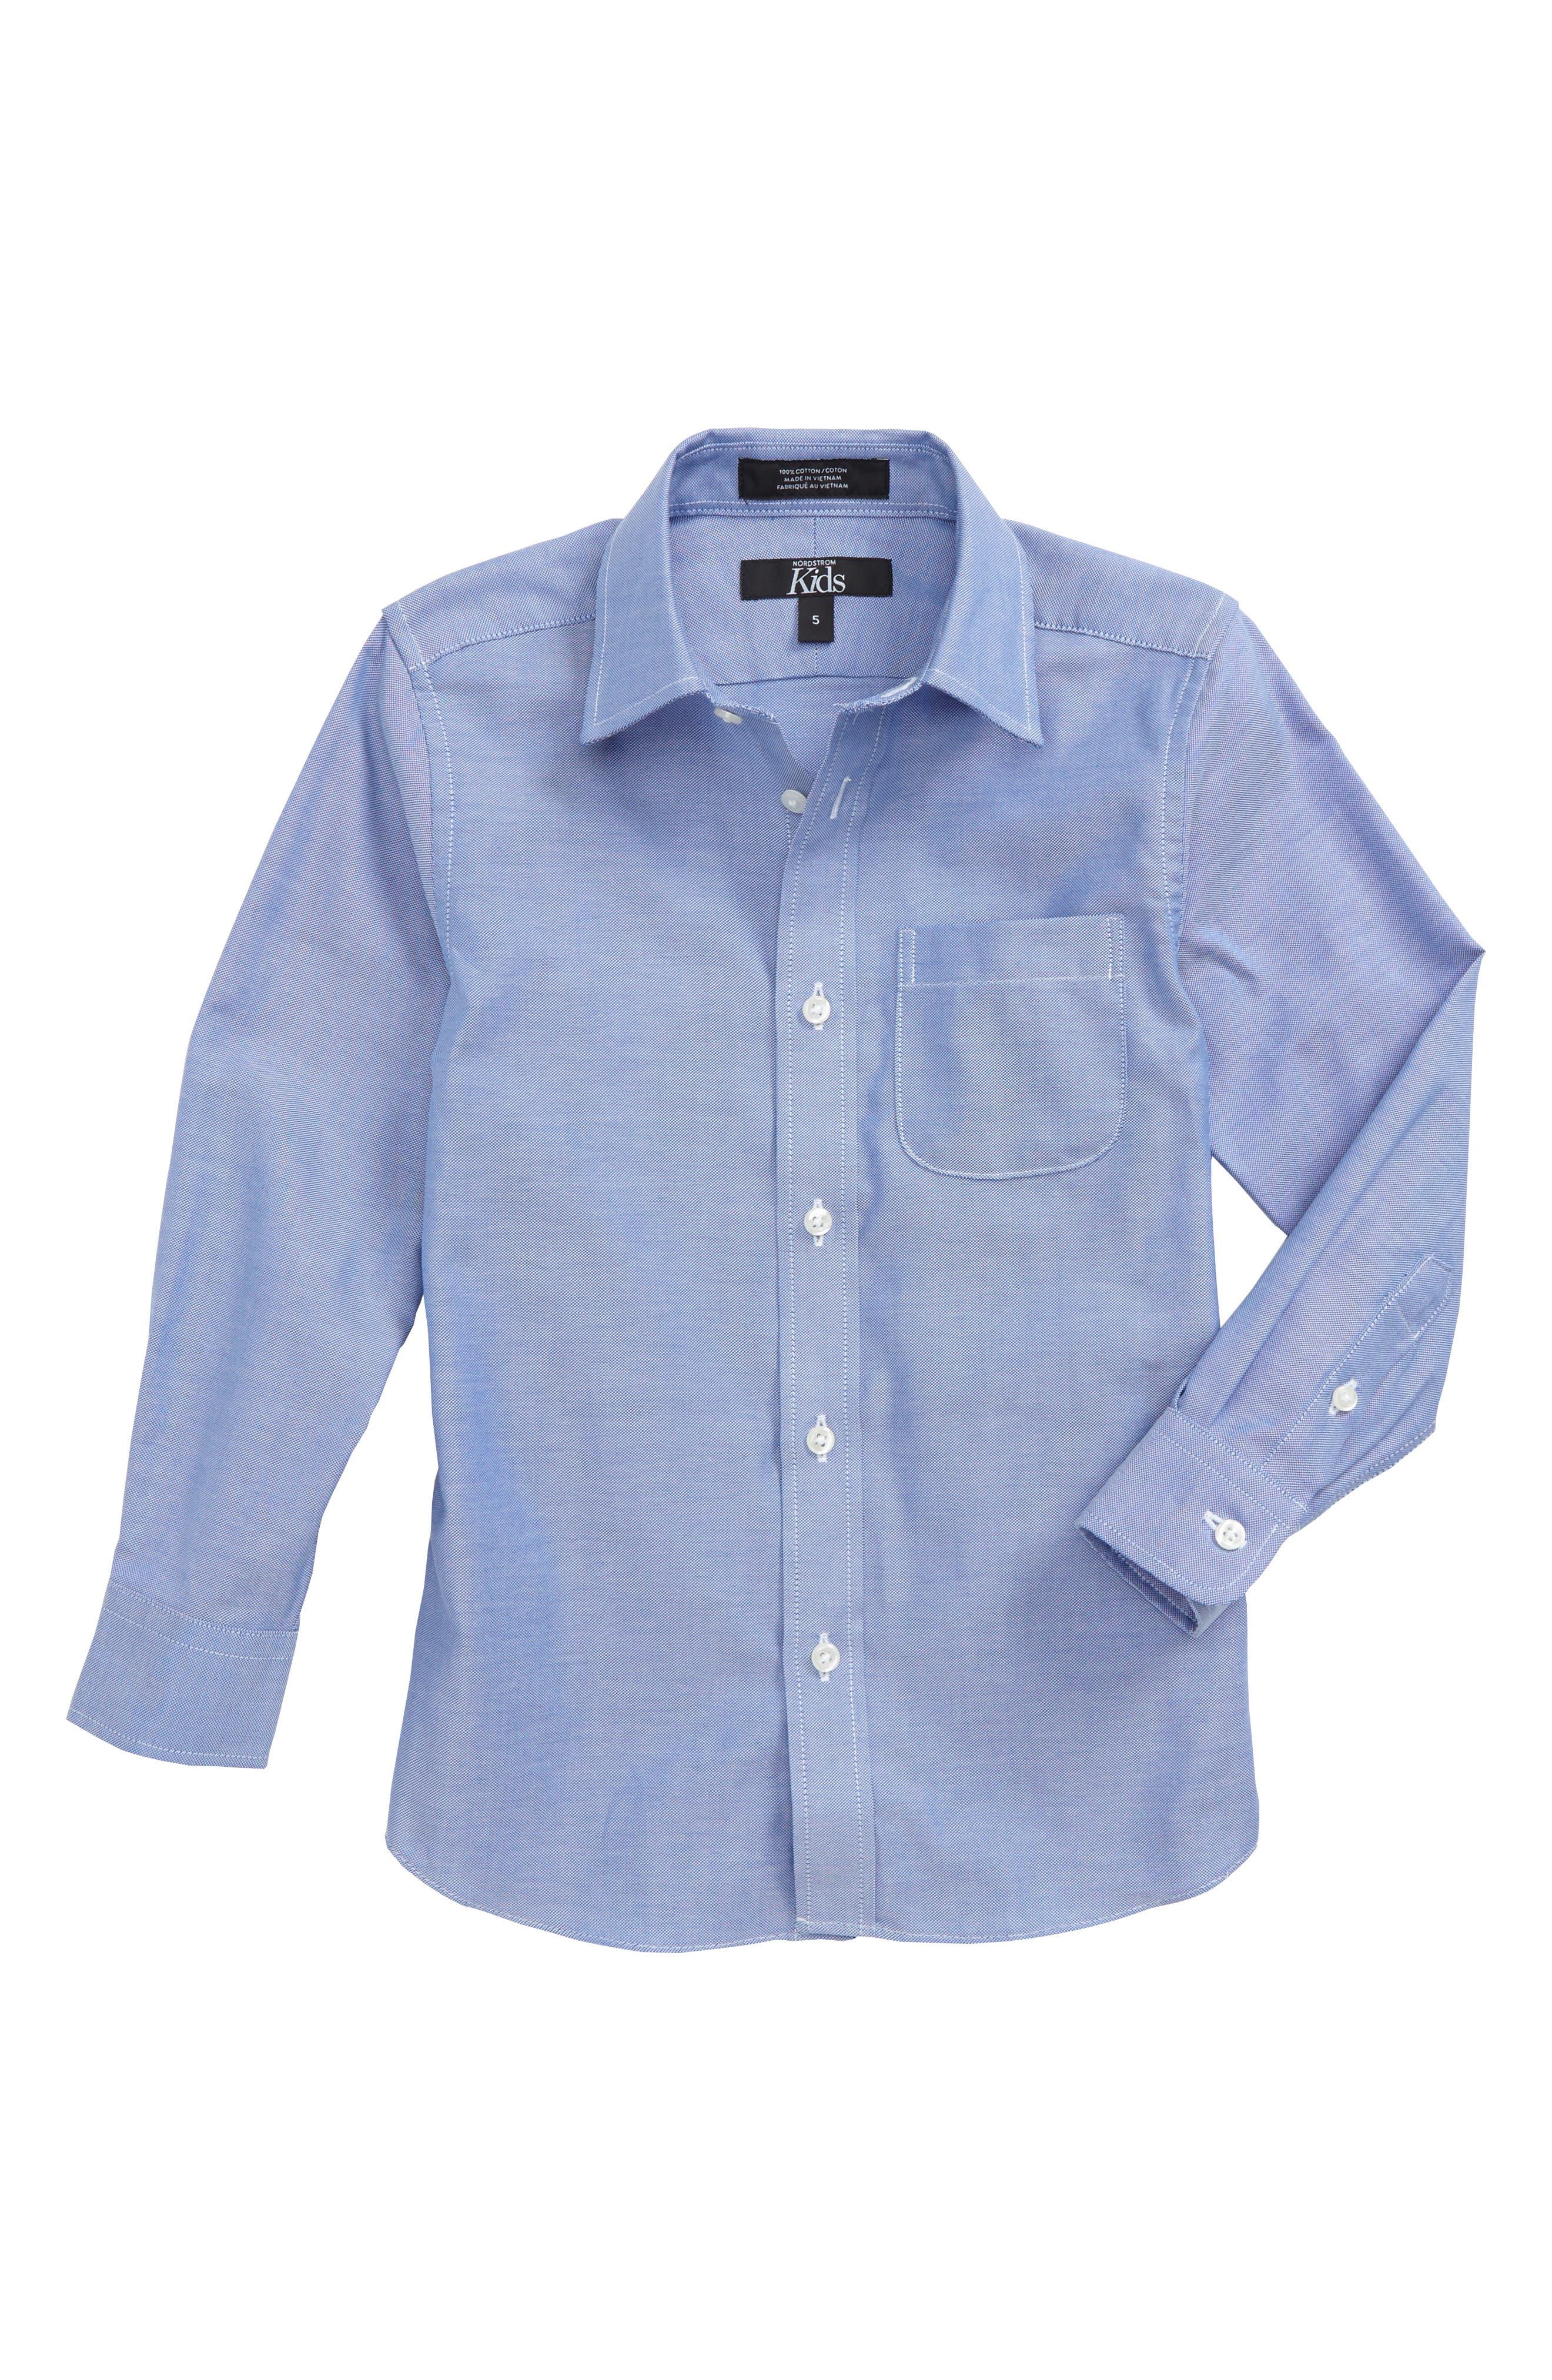 Nordstrom Check Dress Shirt (Big Boys)